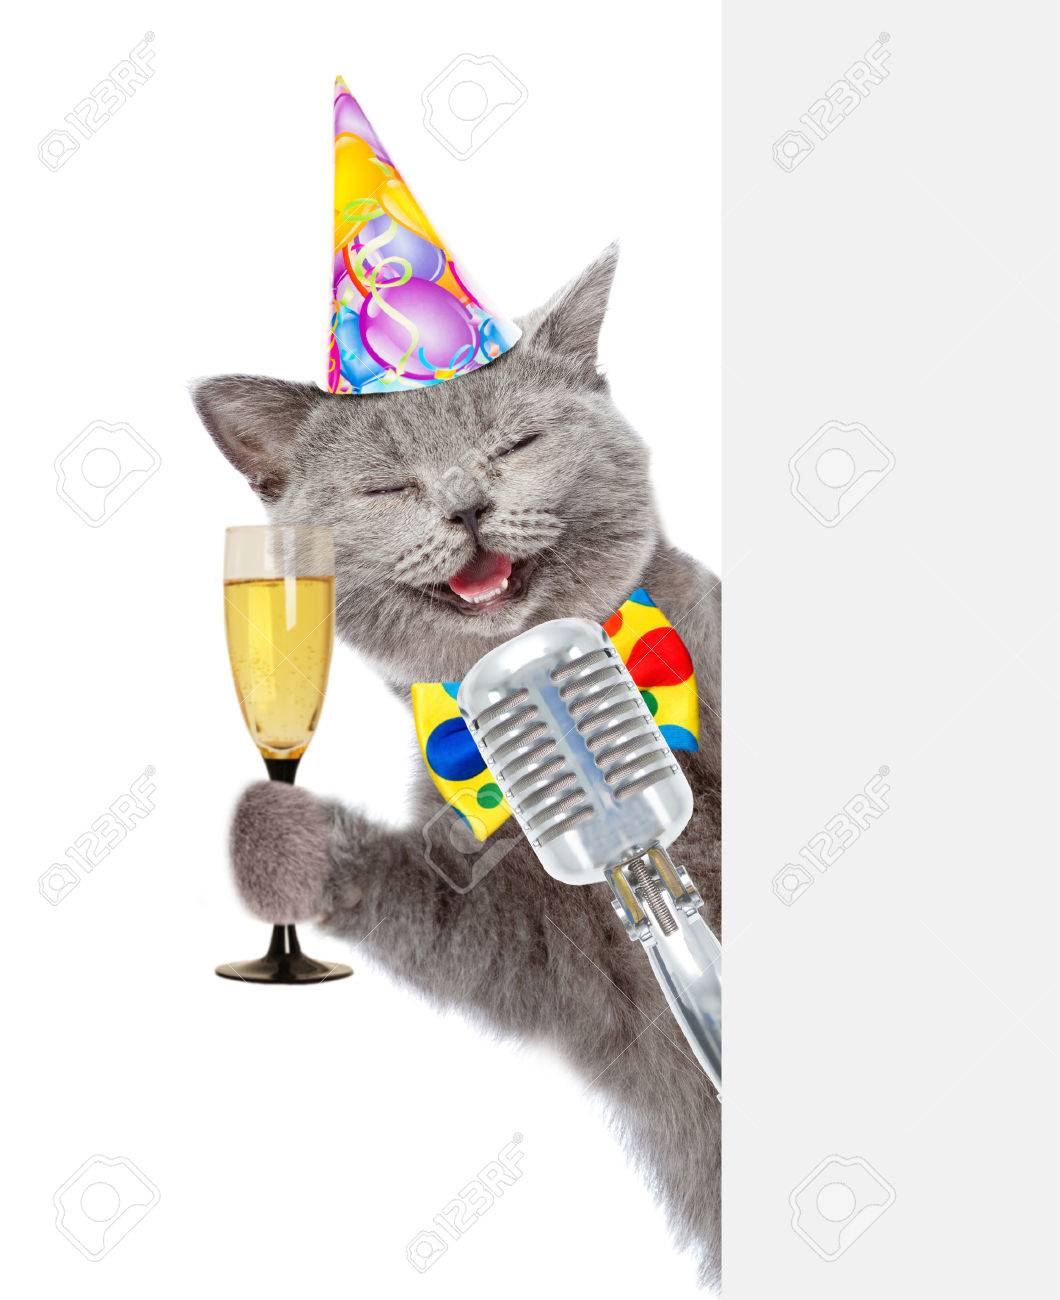 Kat In Verjaardag Hoed Houdt Retro Microfoon En Een Glas Champagne